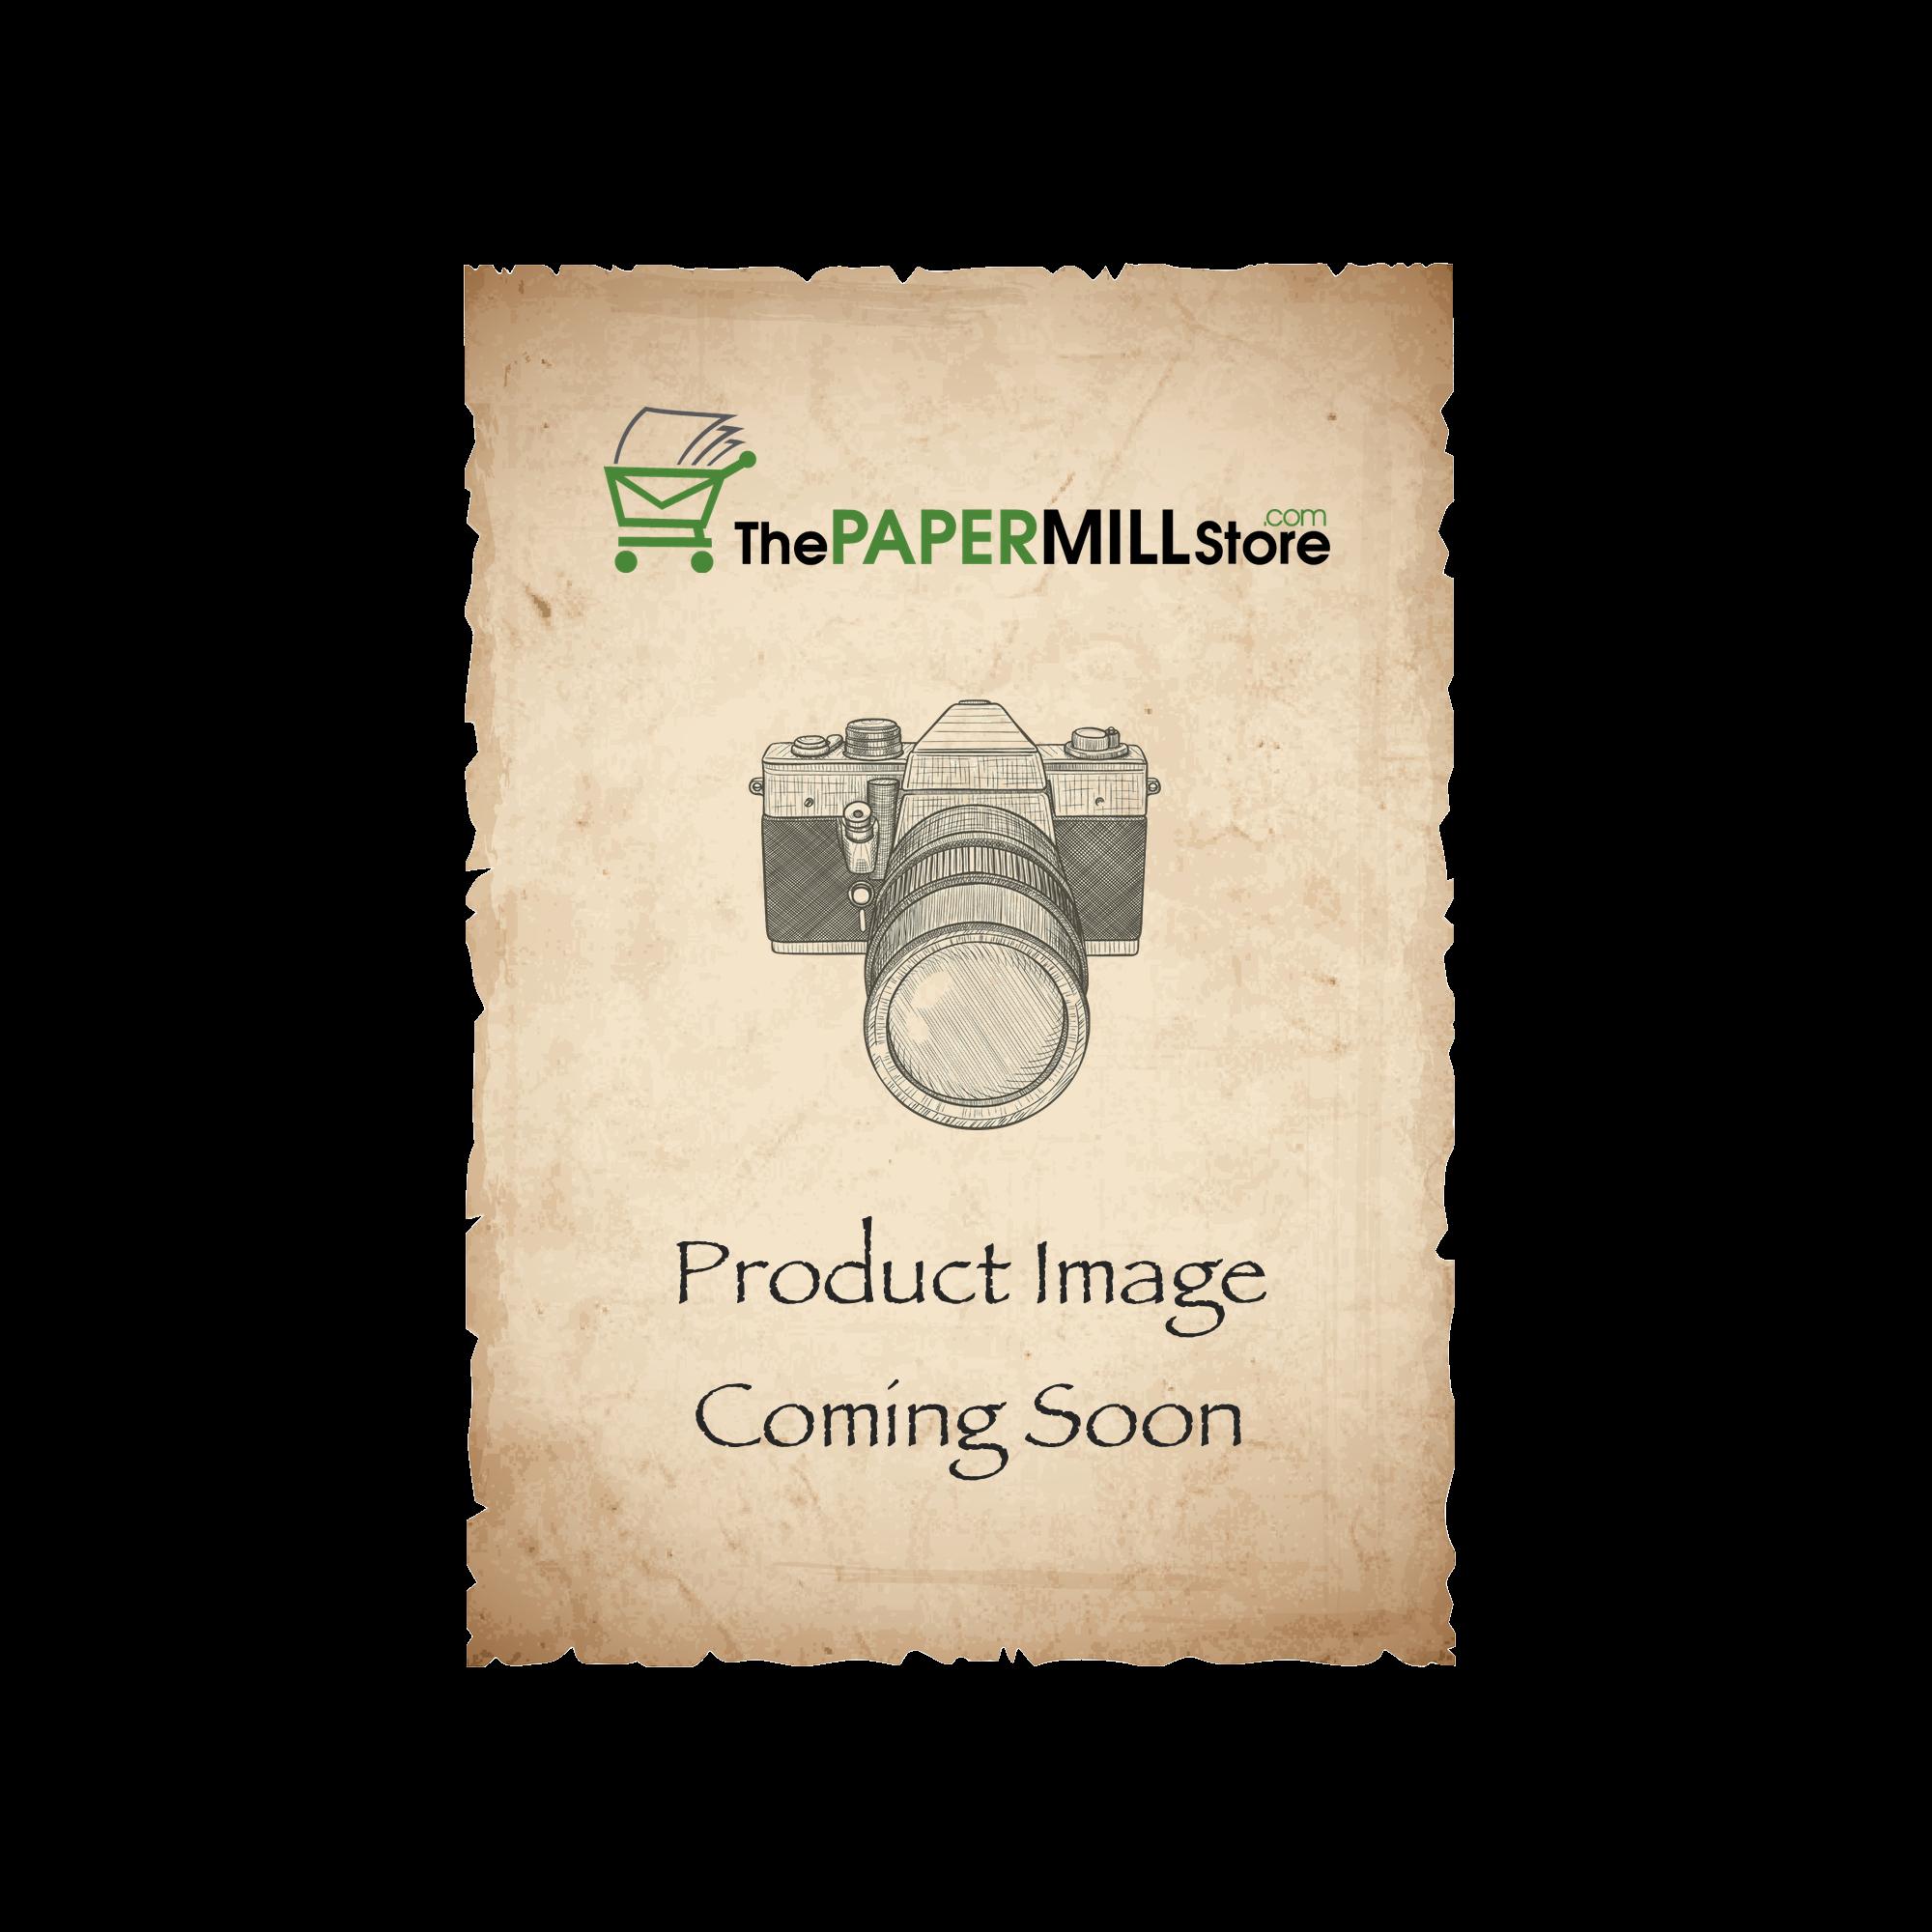 Buy Loop Feltmark Pumice Card Stock - 26 x 40 in 110 lb Cover Feltmark  100% Recycled 300 per Carton at The Paper Mill Store .com